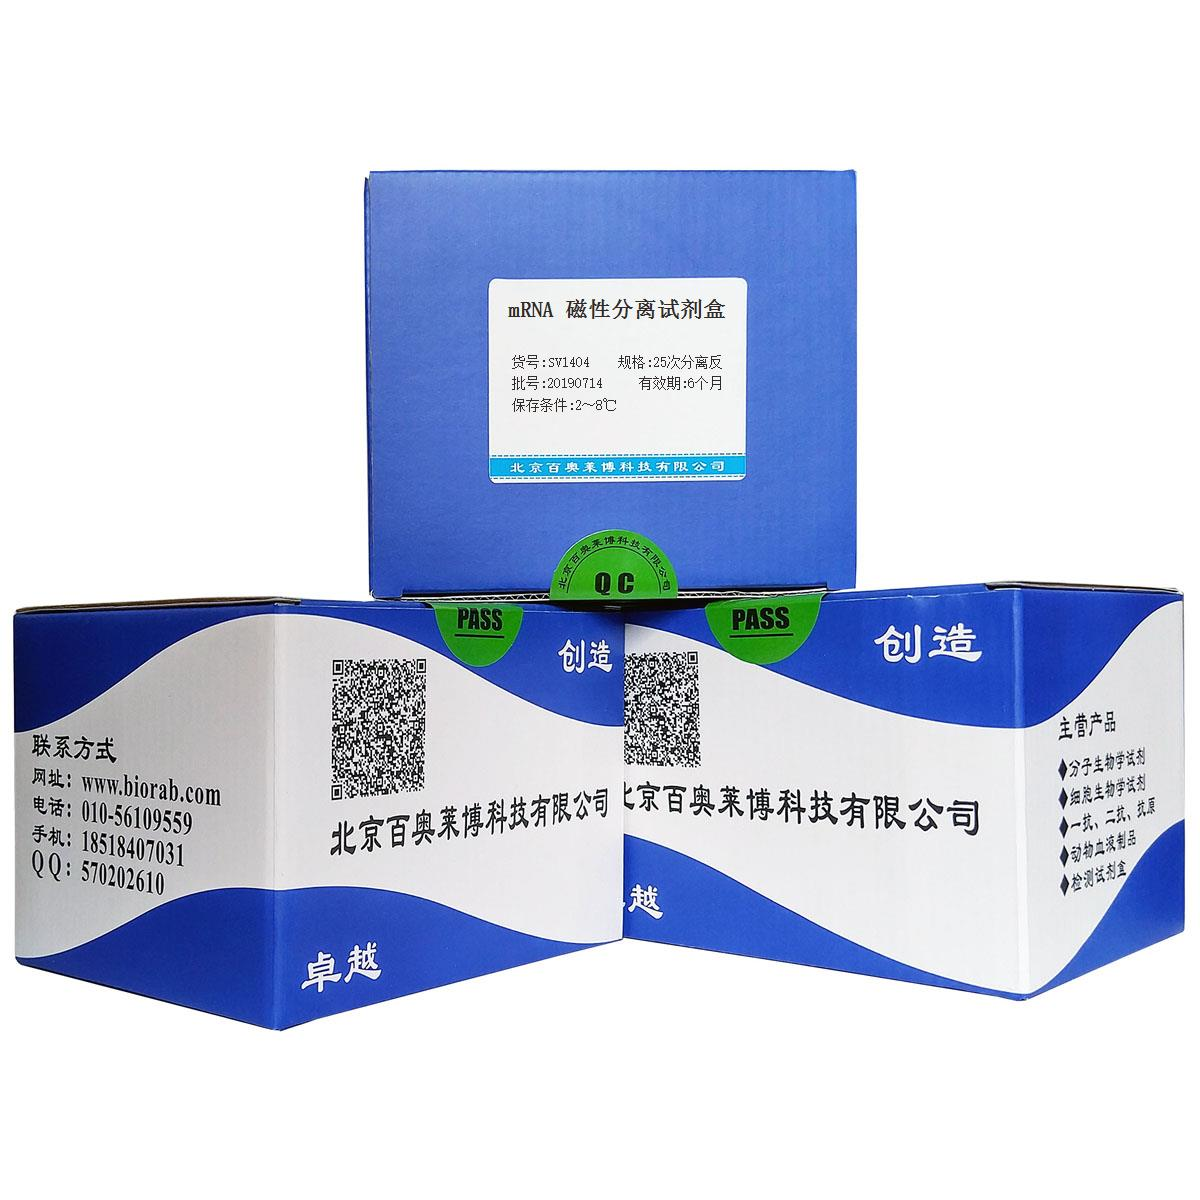 mRNA 磁性分离试剂盒北京现货